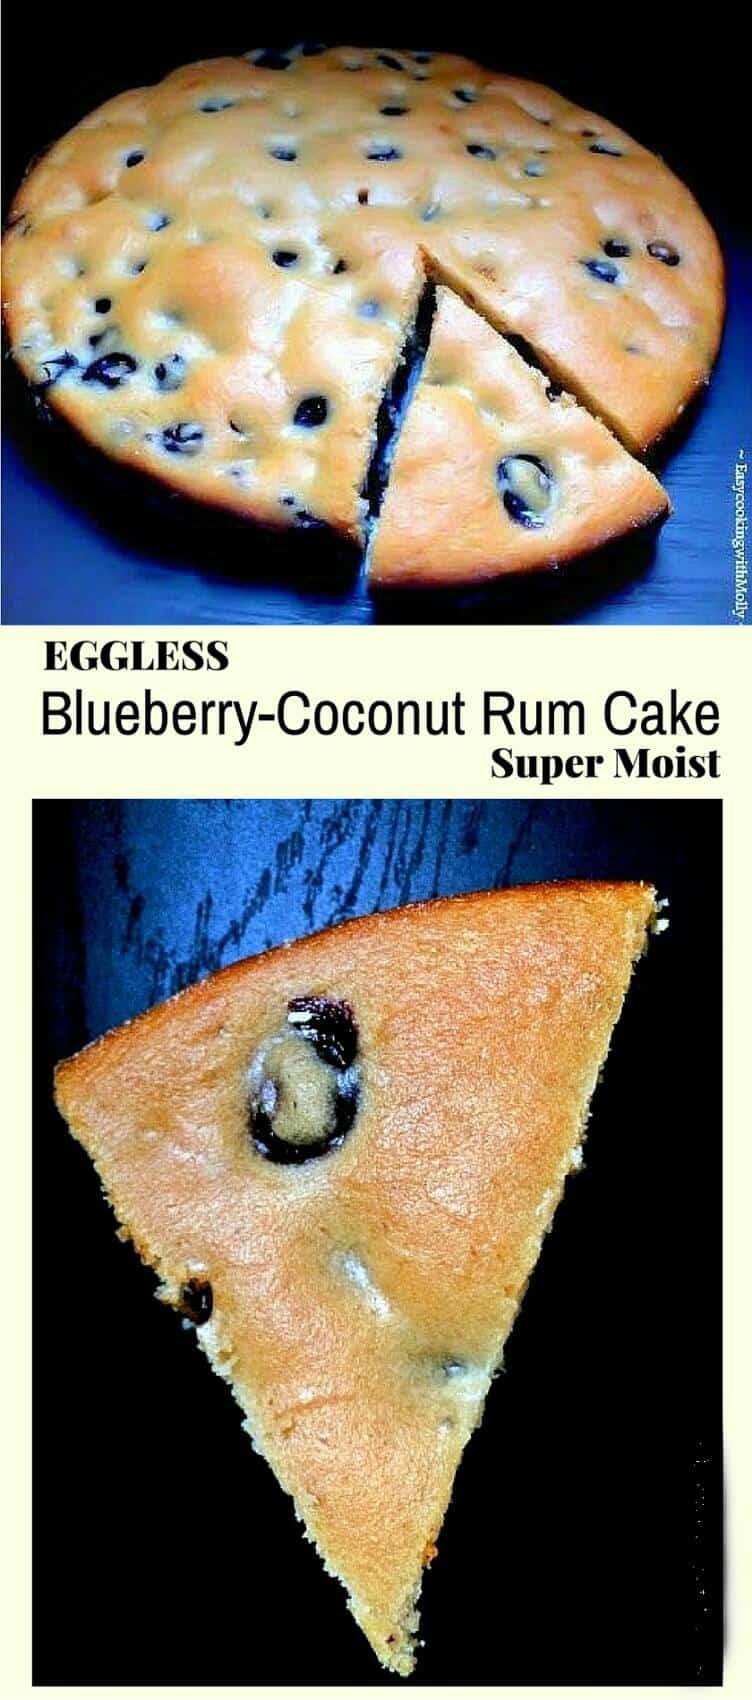 Eggless Blueberry-Coconut Rum Cake (Super Moist) : #blueberry #rum #cake #recipe #fathersday